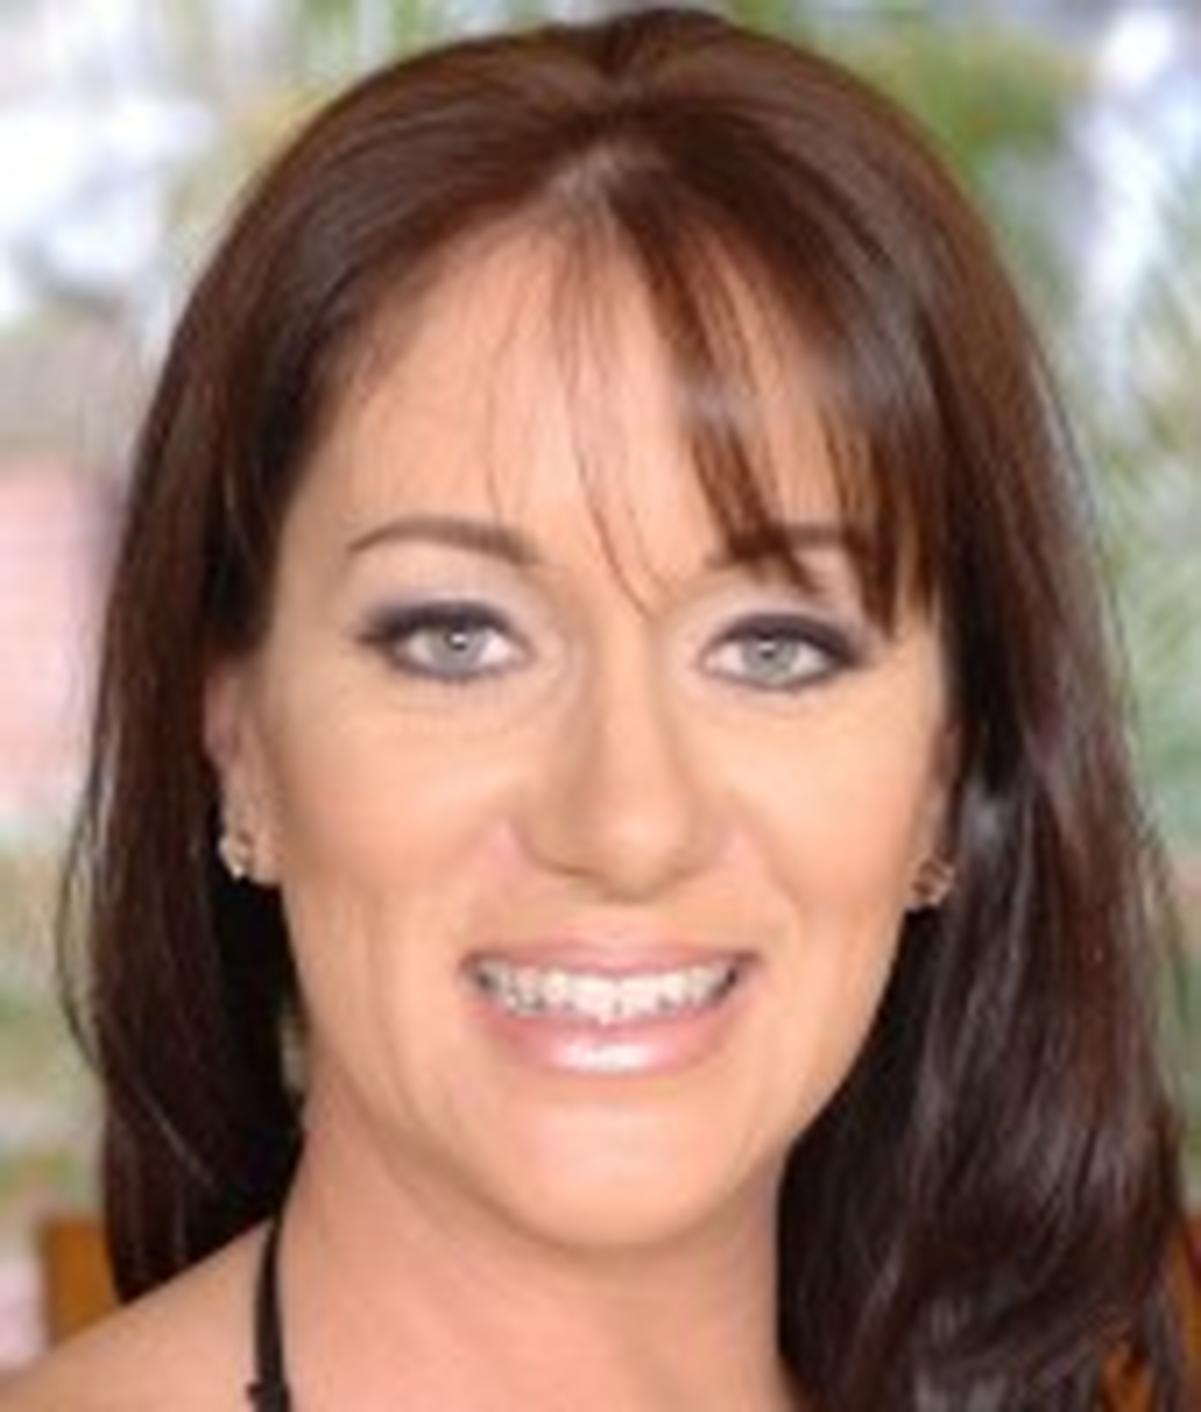 Actor Porno Español Sandy sandy beach wiki & bio - pornographic actress